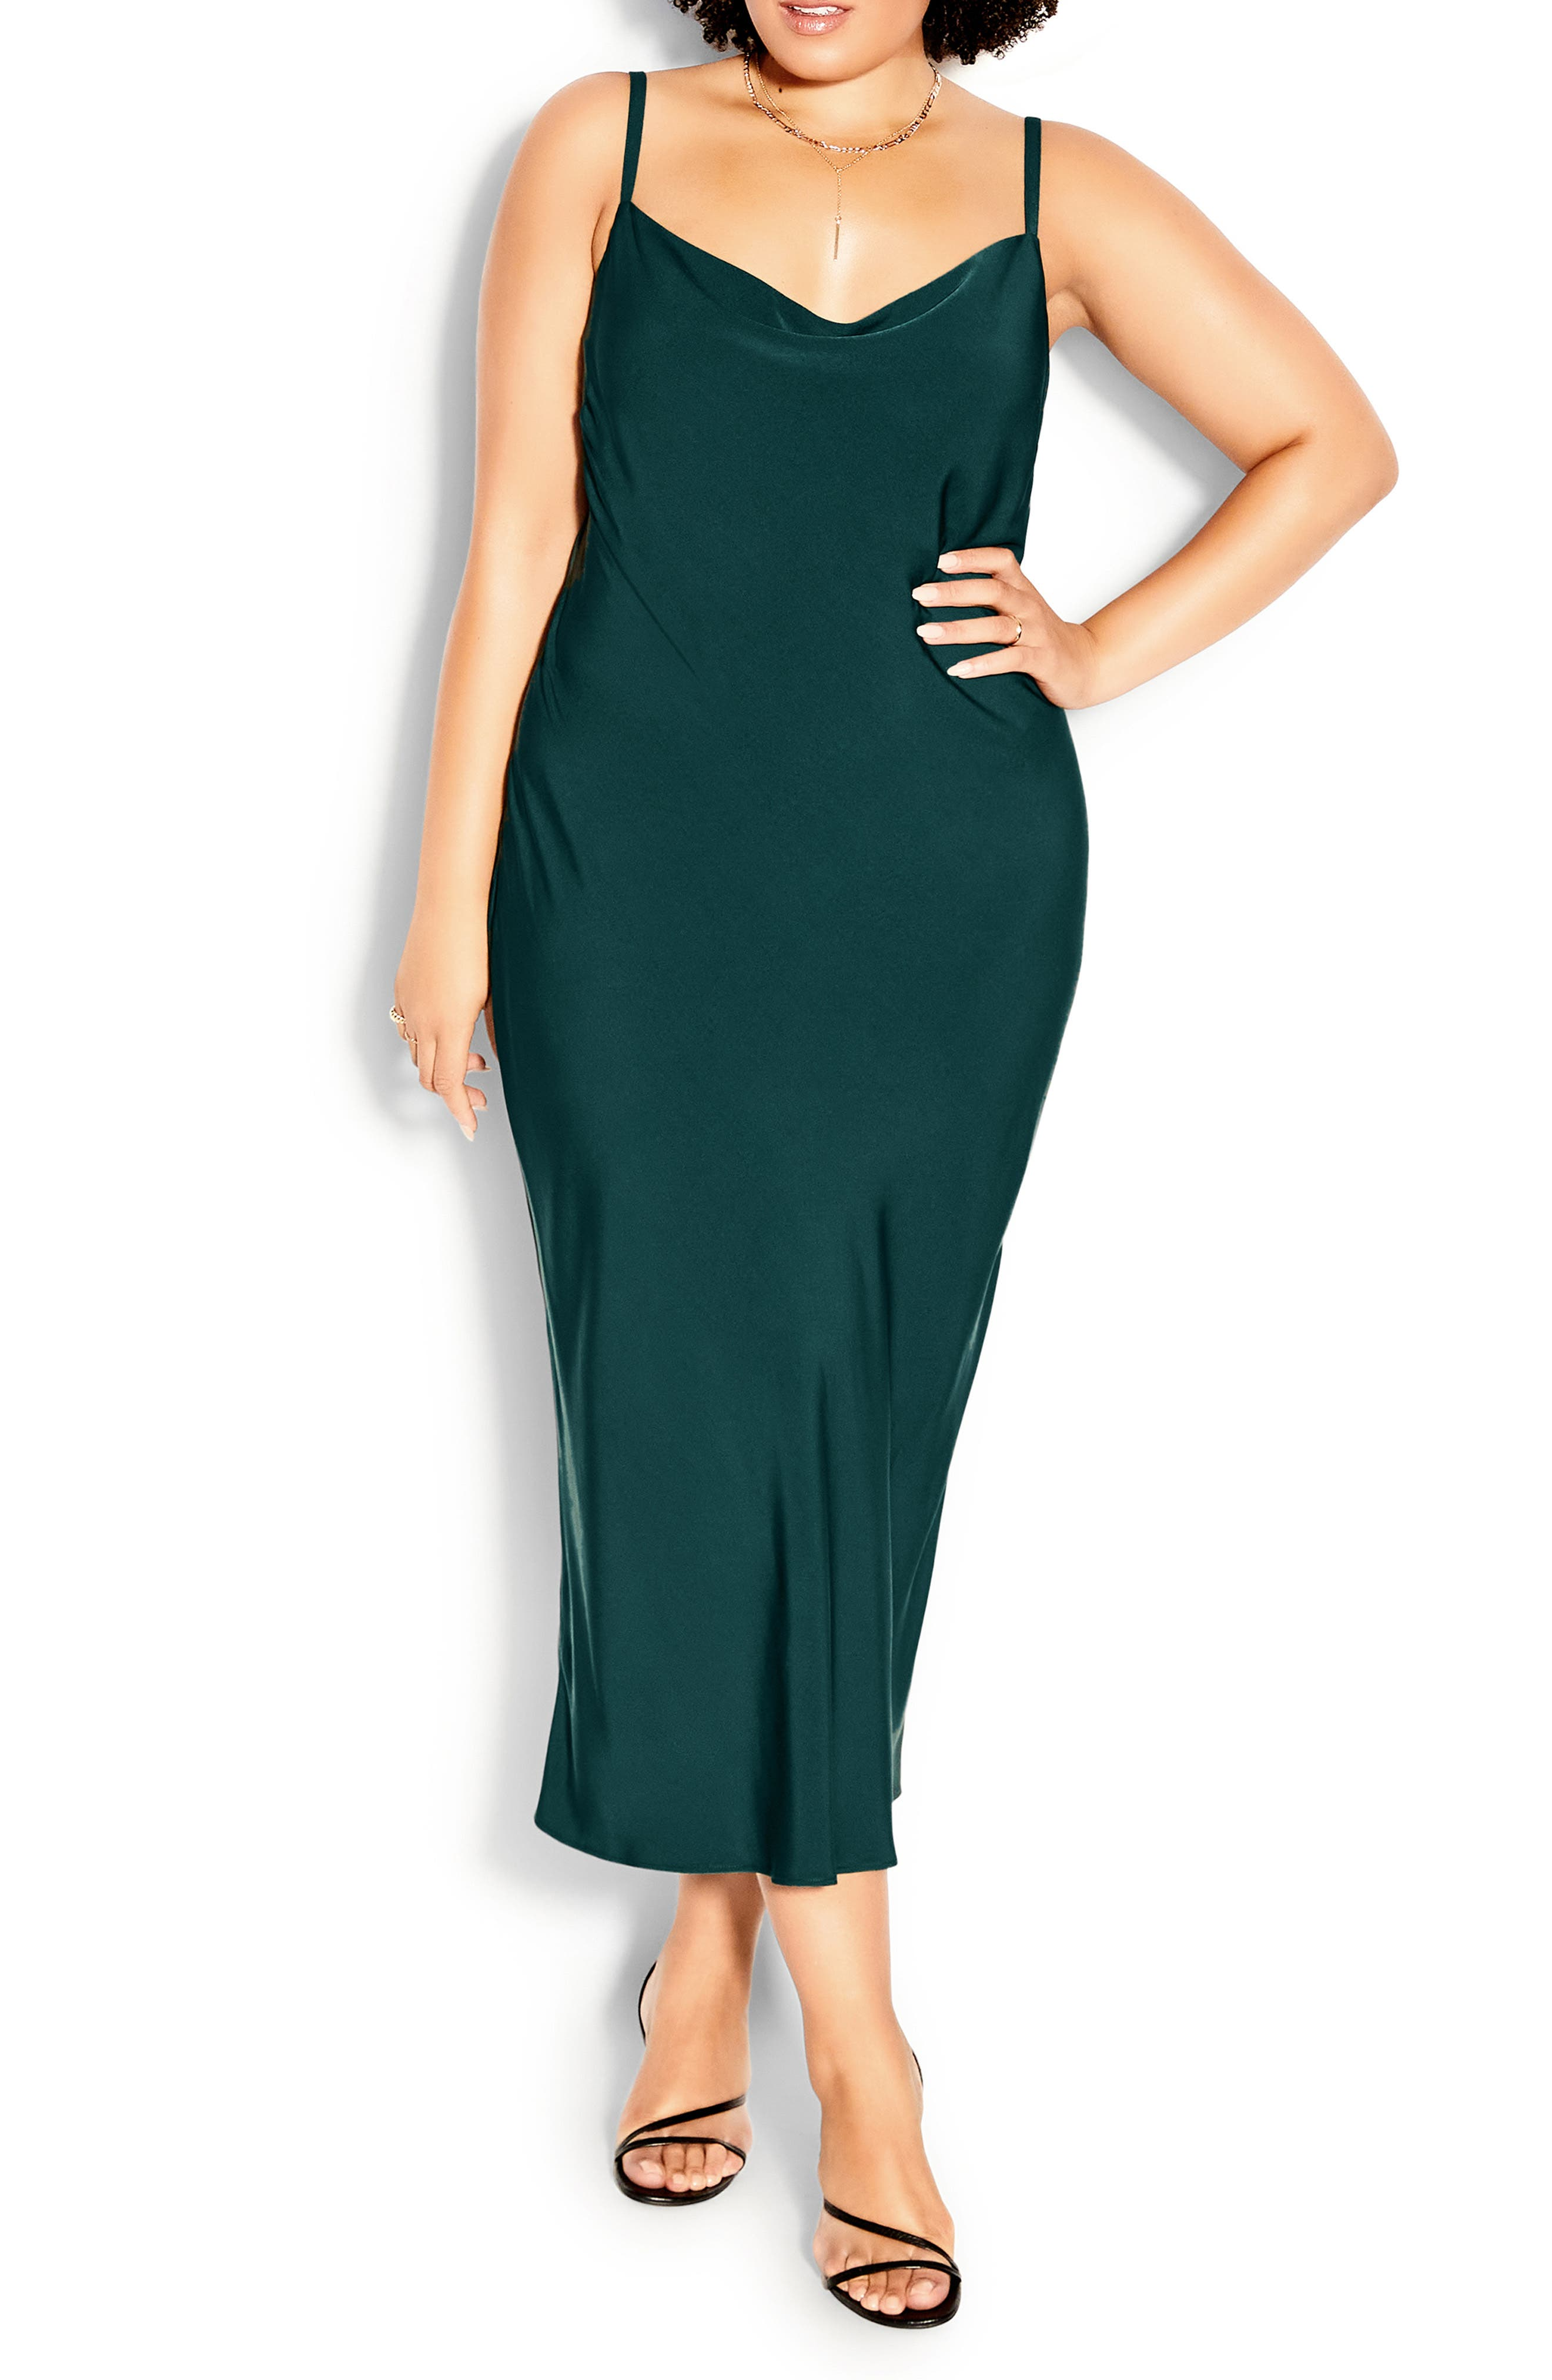 Plus Size Women's Chic City Shimmer Cowl Neck Slipdress